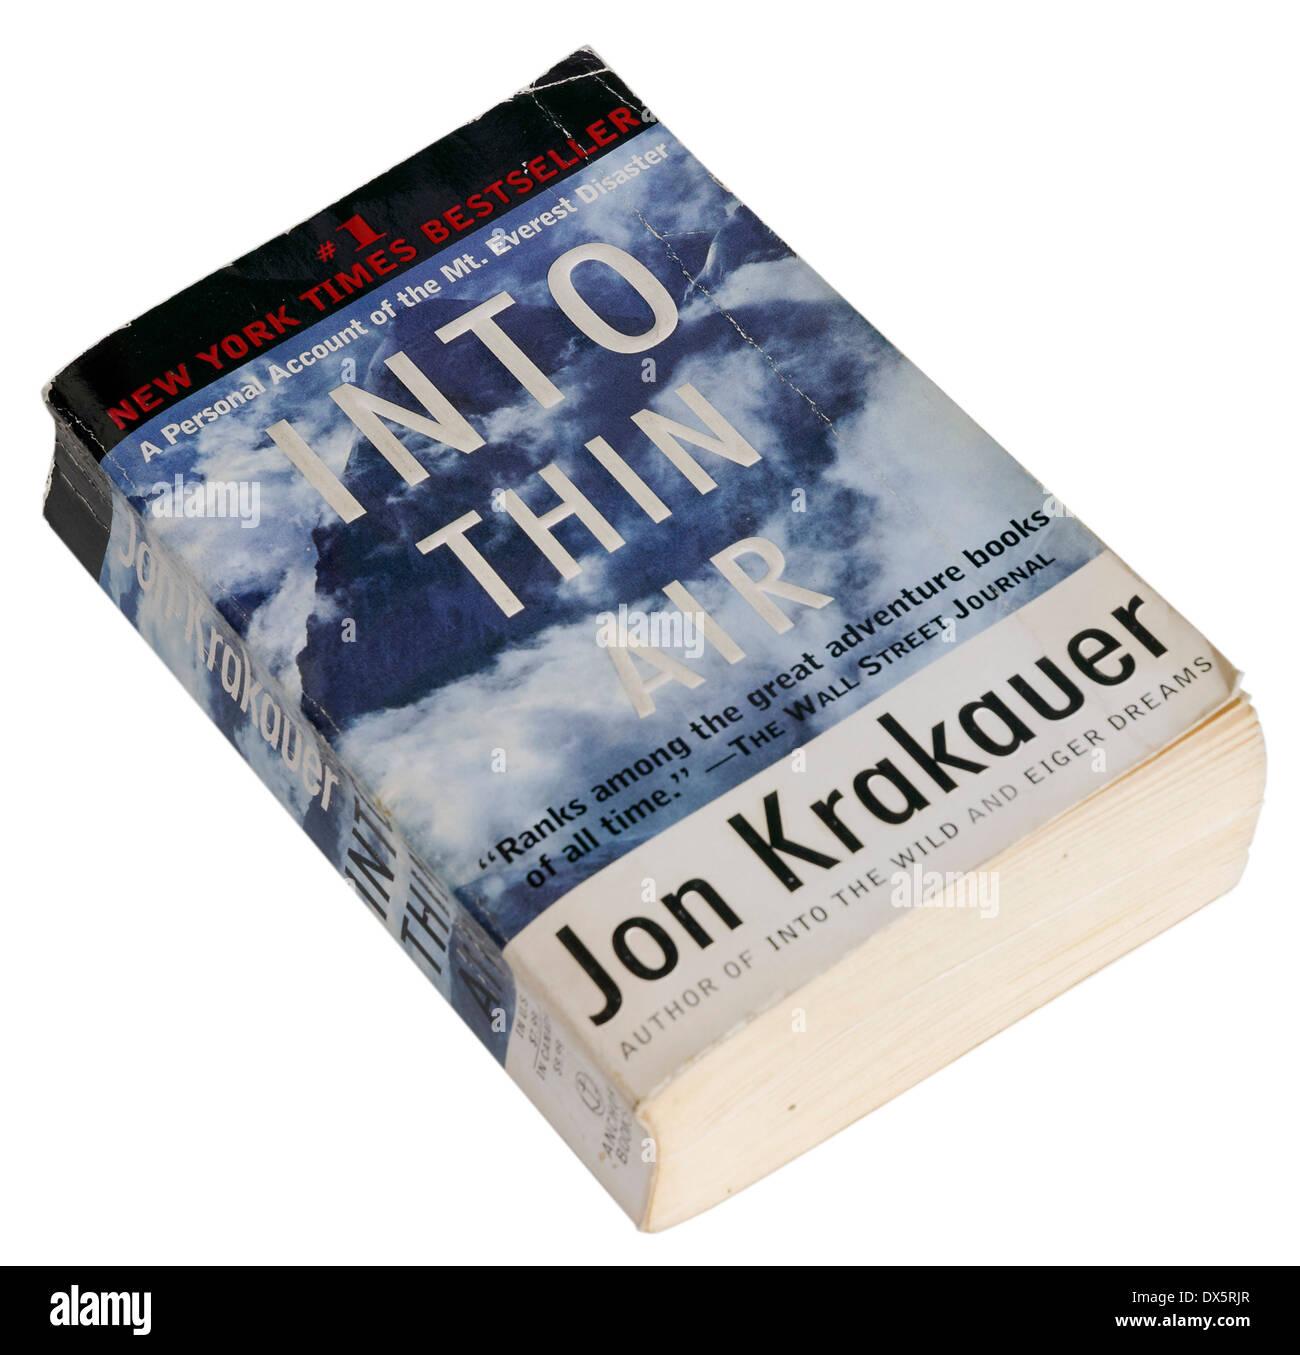 Into Thin Air by Jon Krakauer